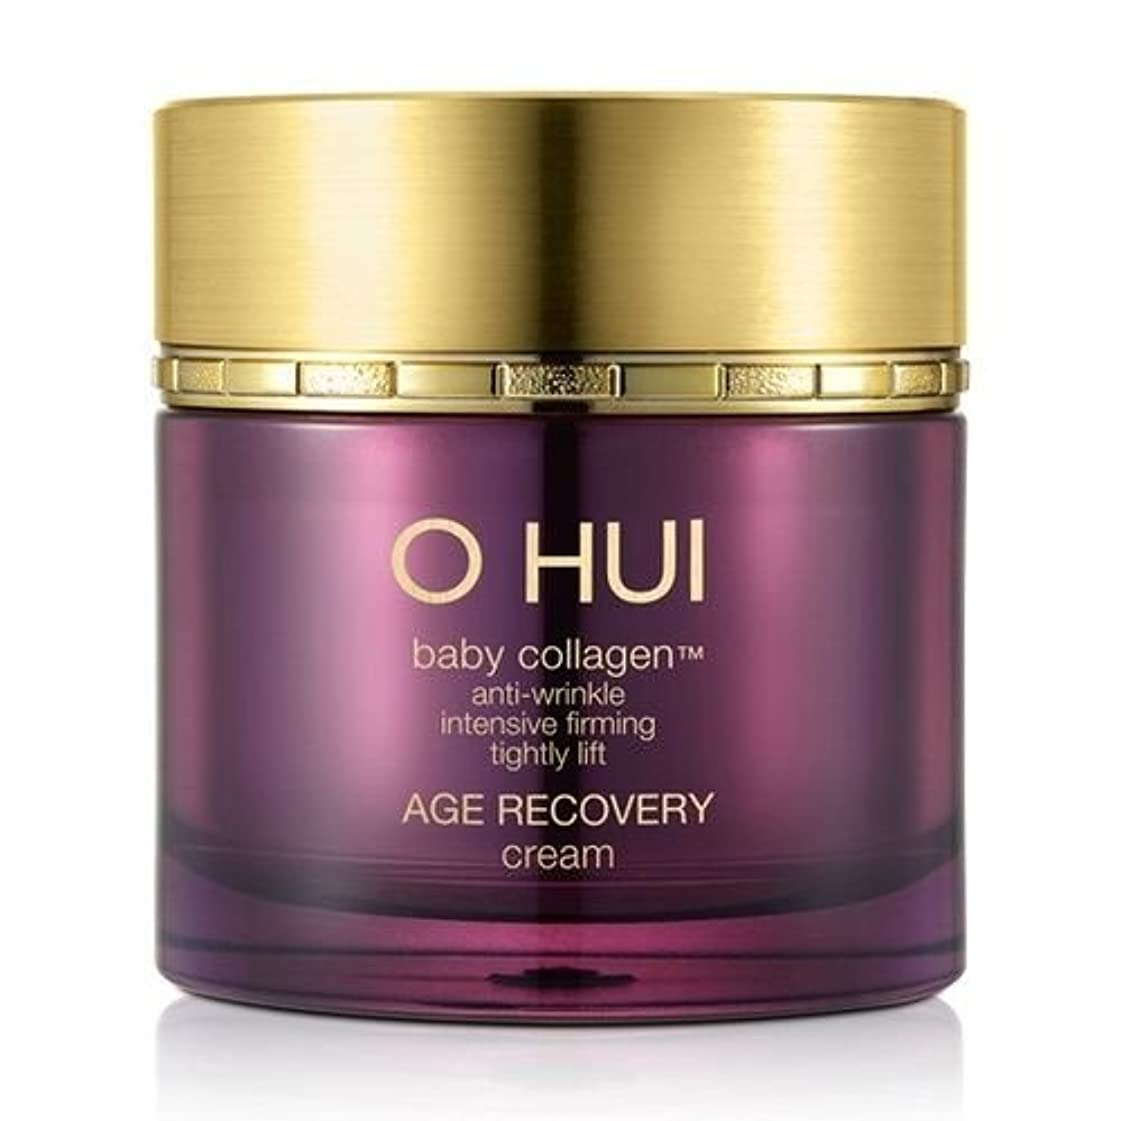 建設貨物慎重にOHUI Age recovery Cream 50ml シワ改善機能性化粧品 [並行輸入品]